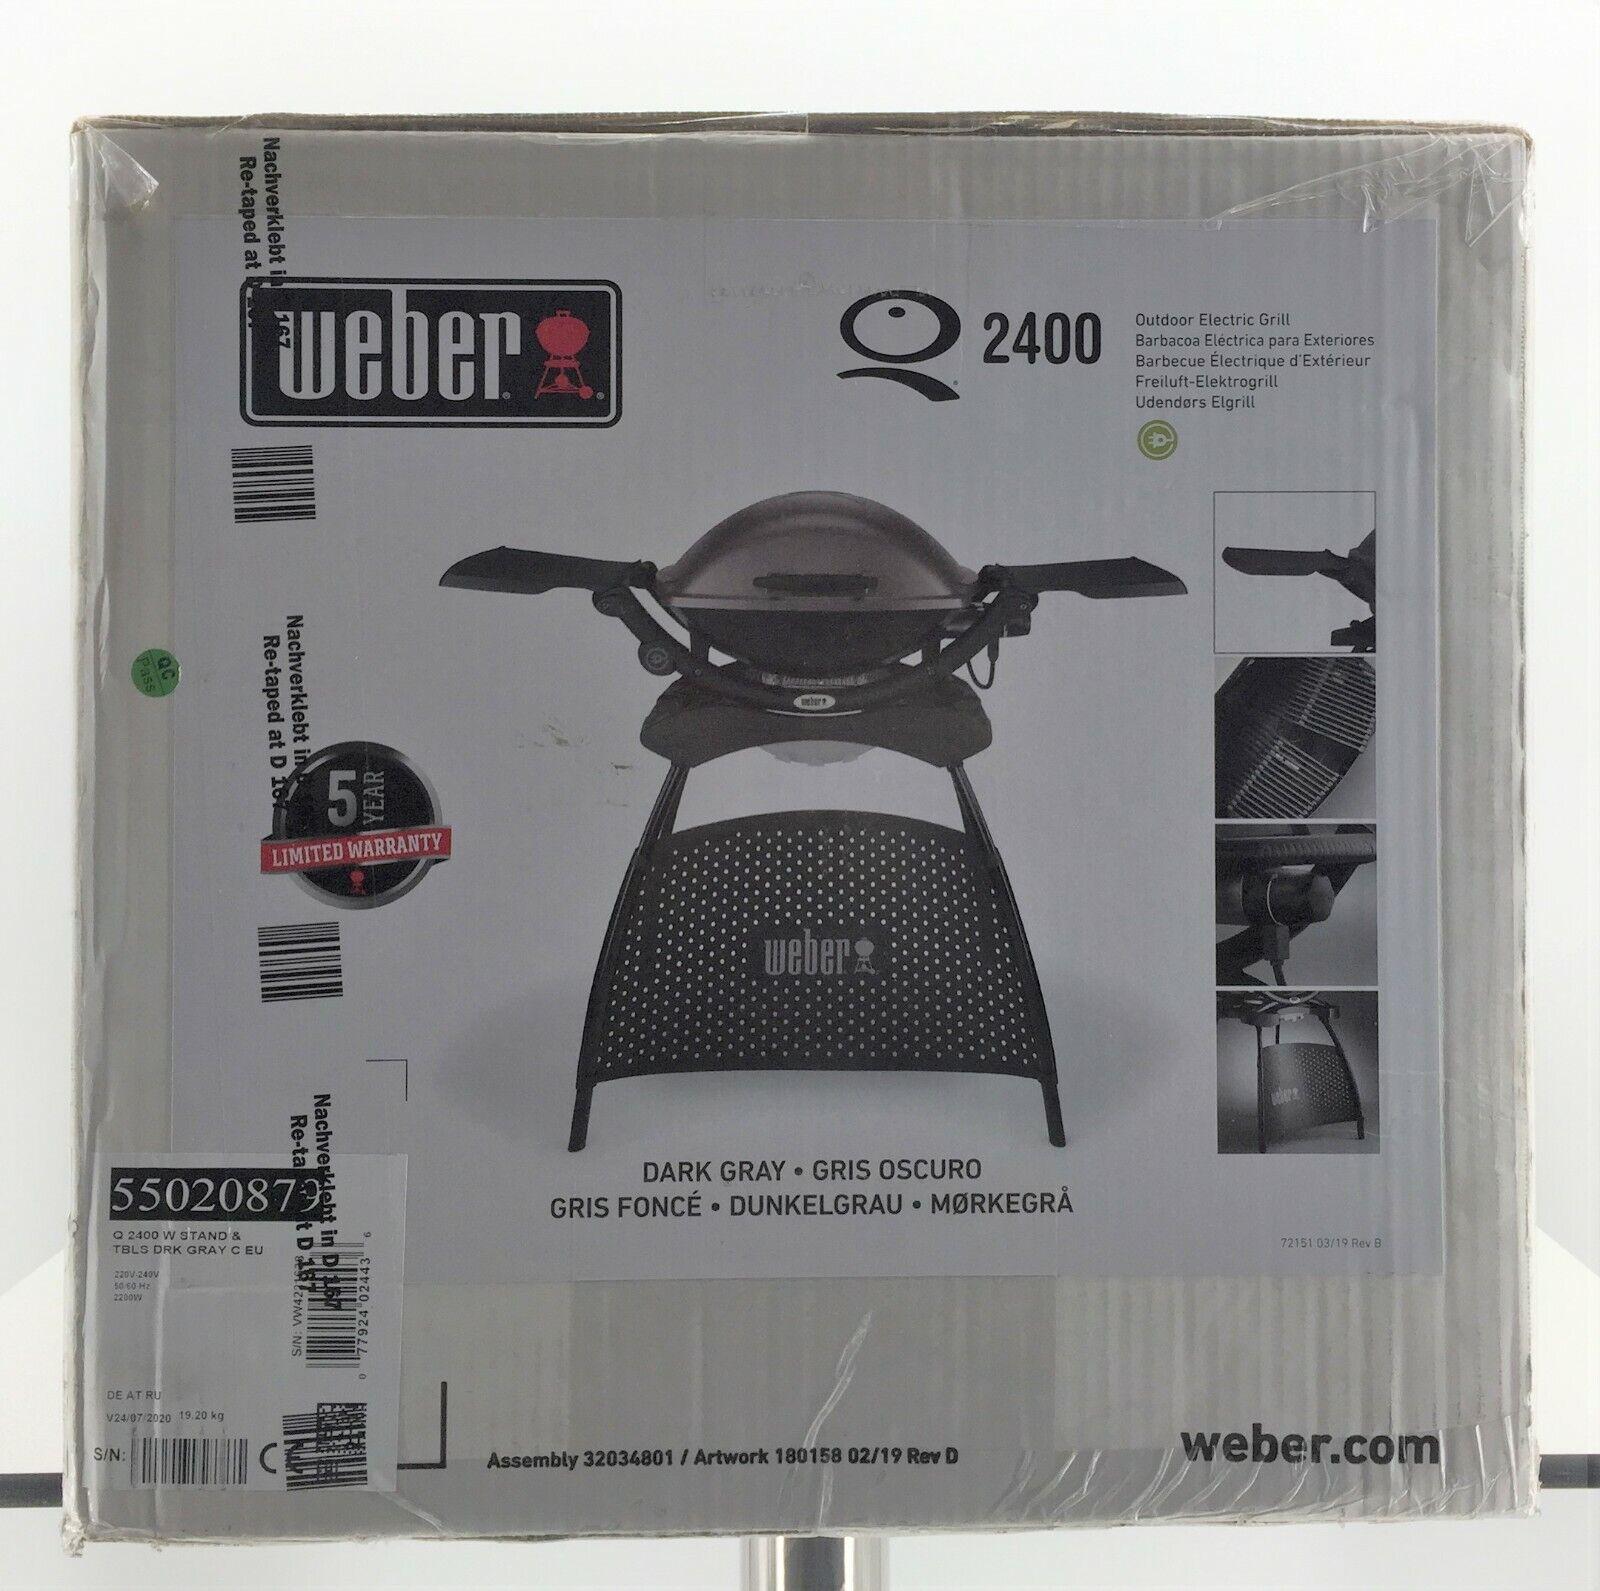 Weber Elektrogrill Q 2400 Stand 55020879 Dunkelgrau